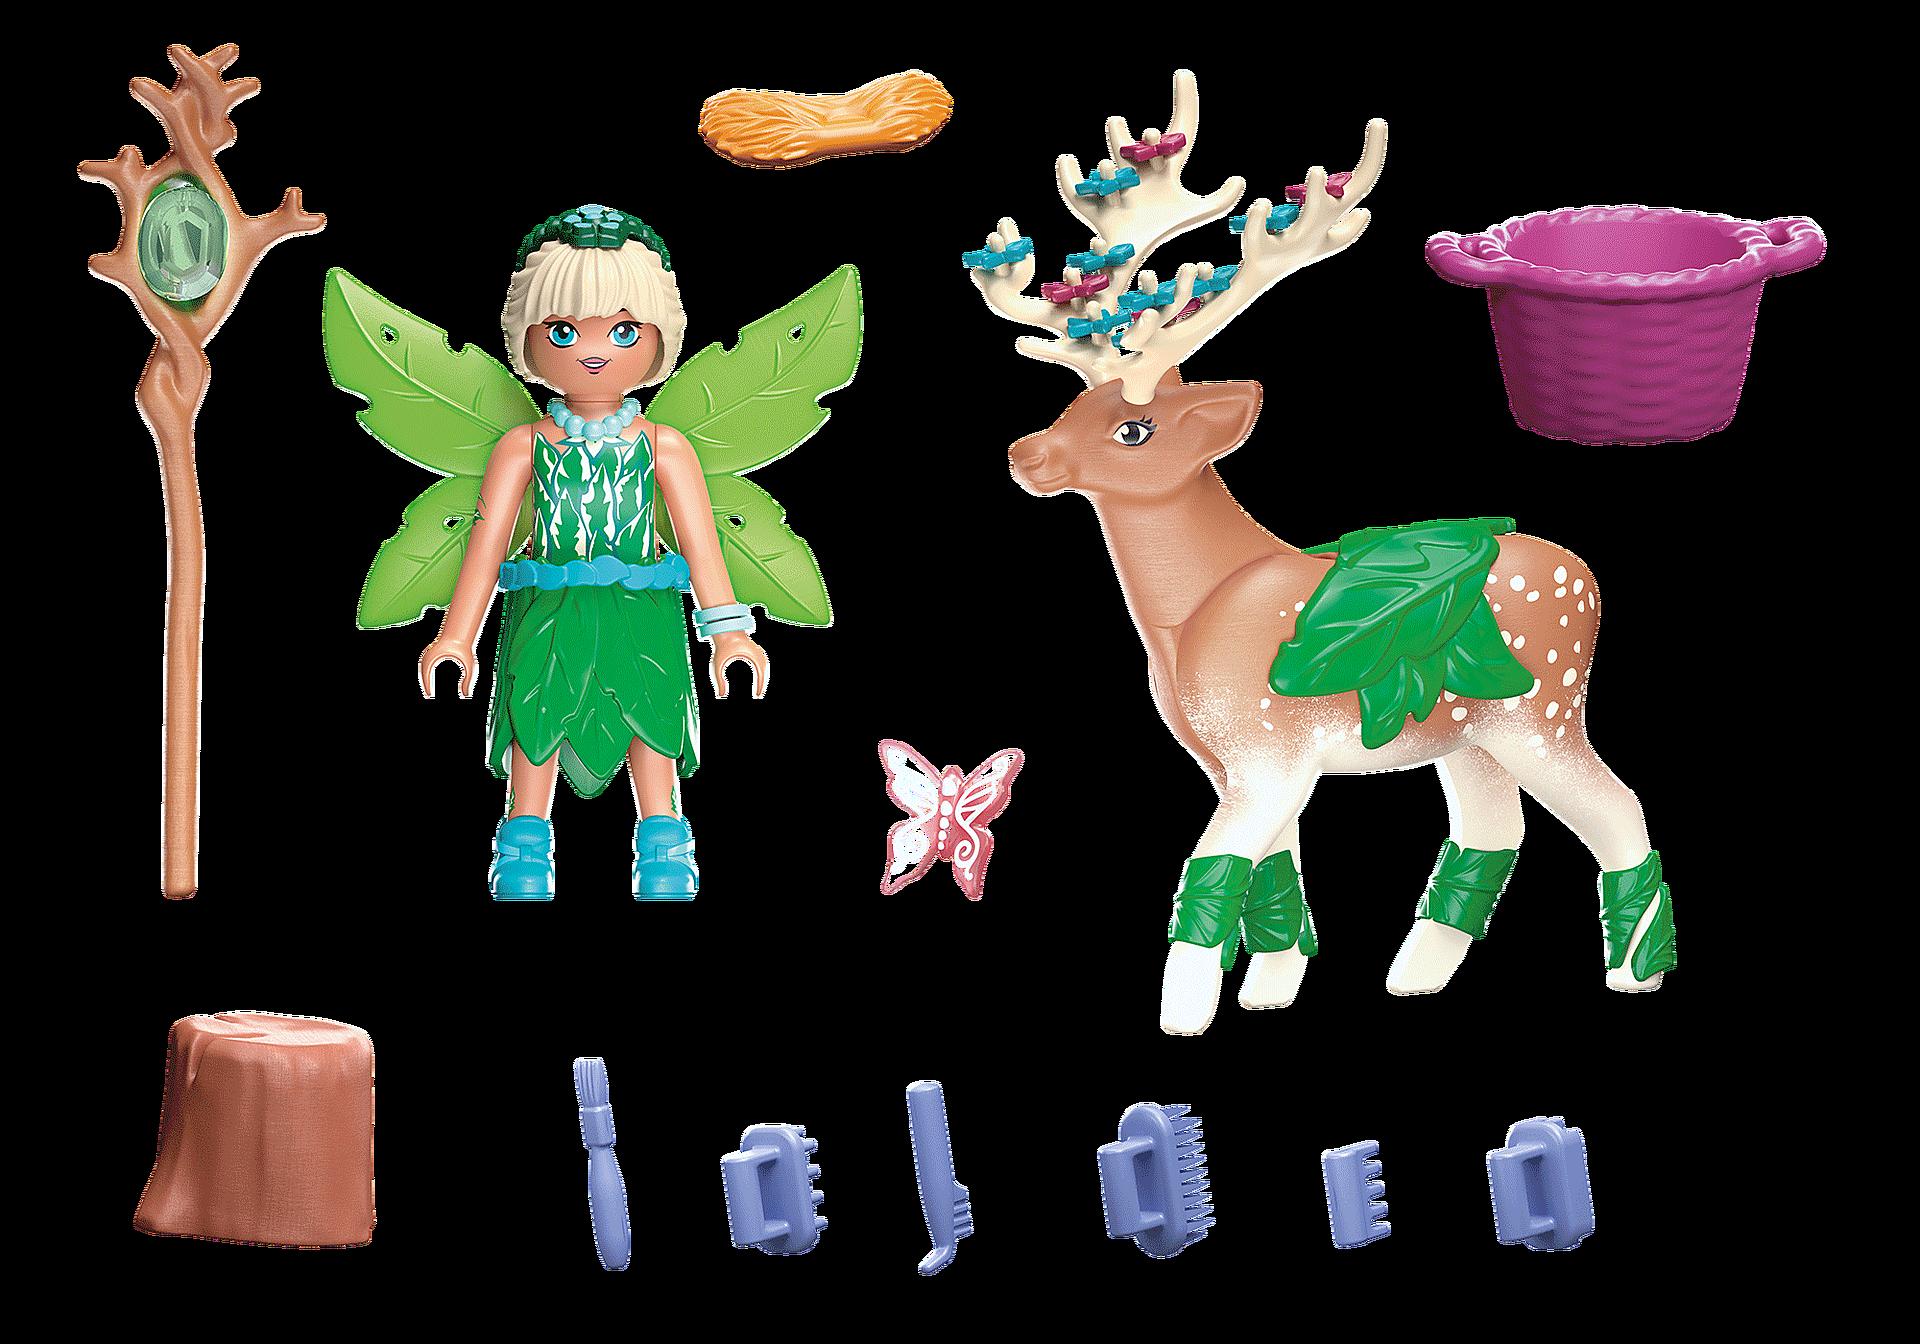 70806 Forest Fairy mit Seelentier zoom image4